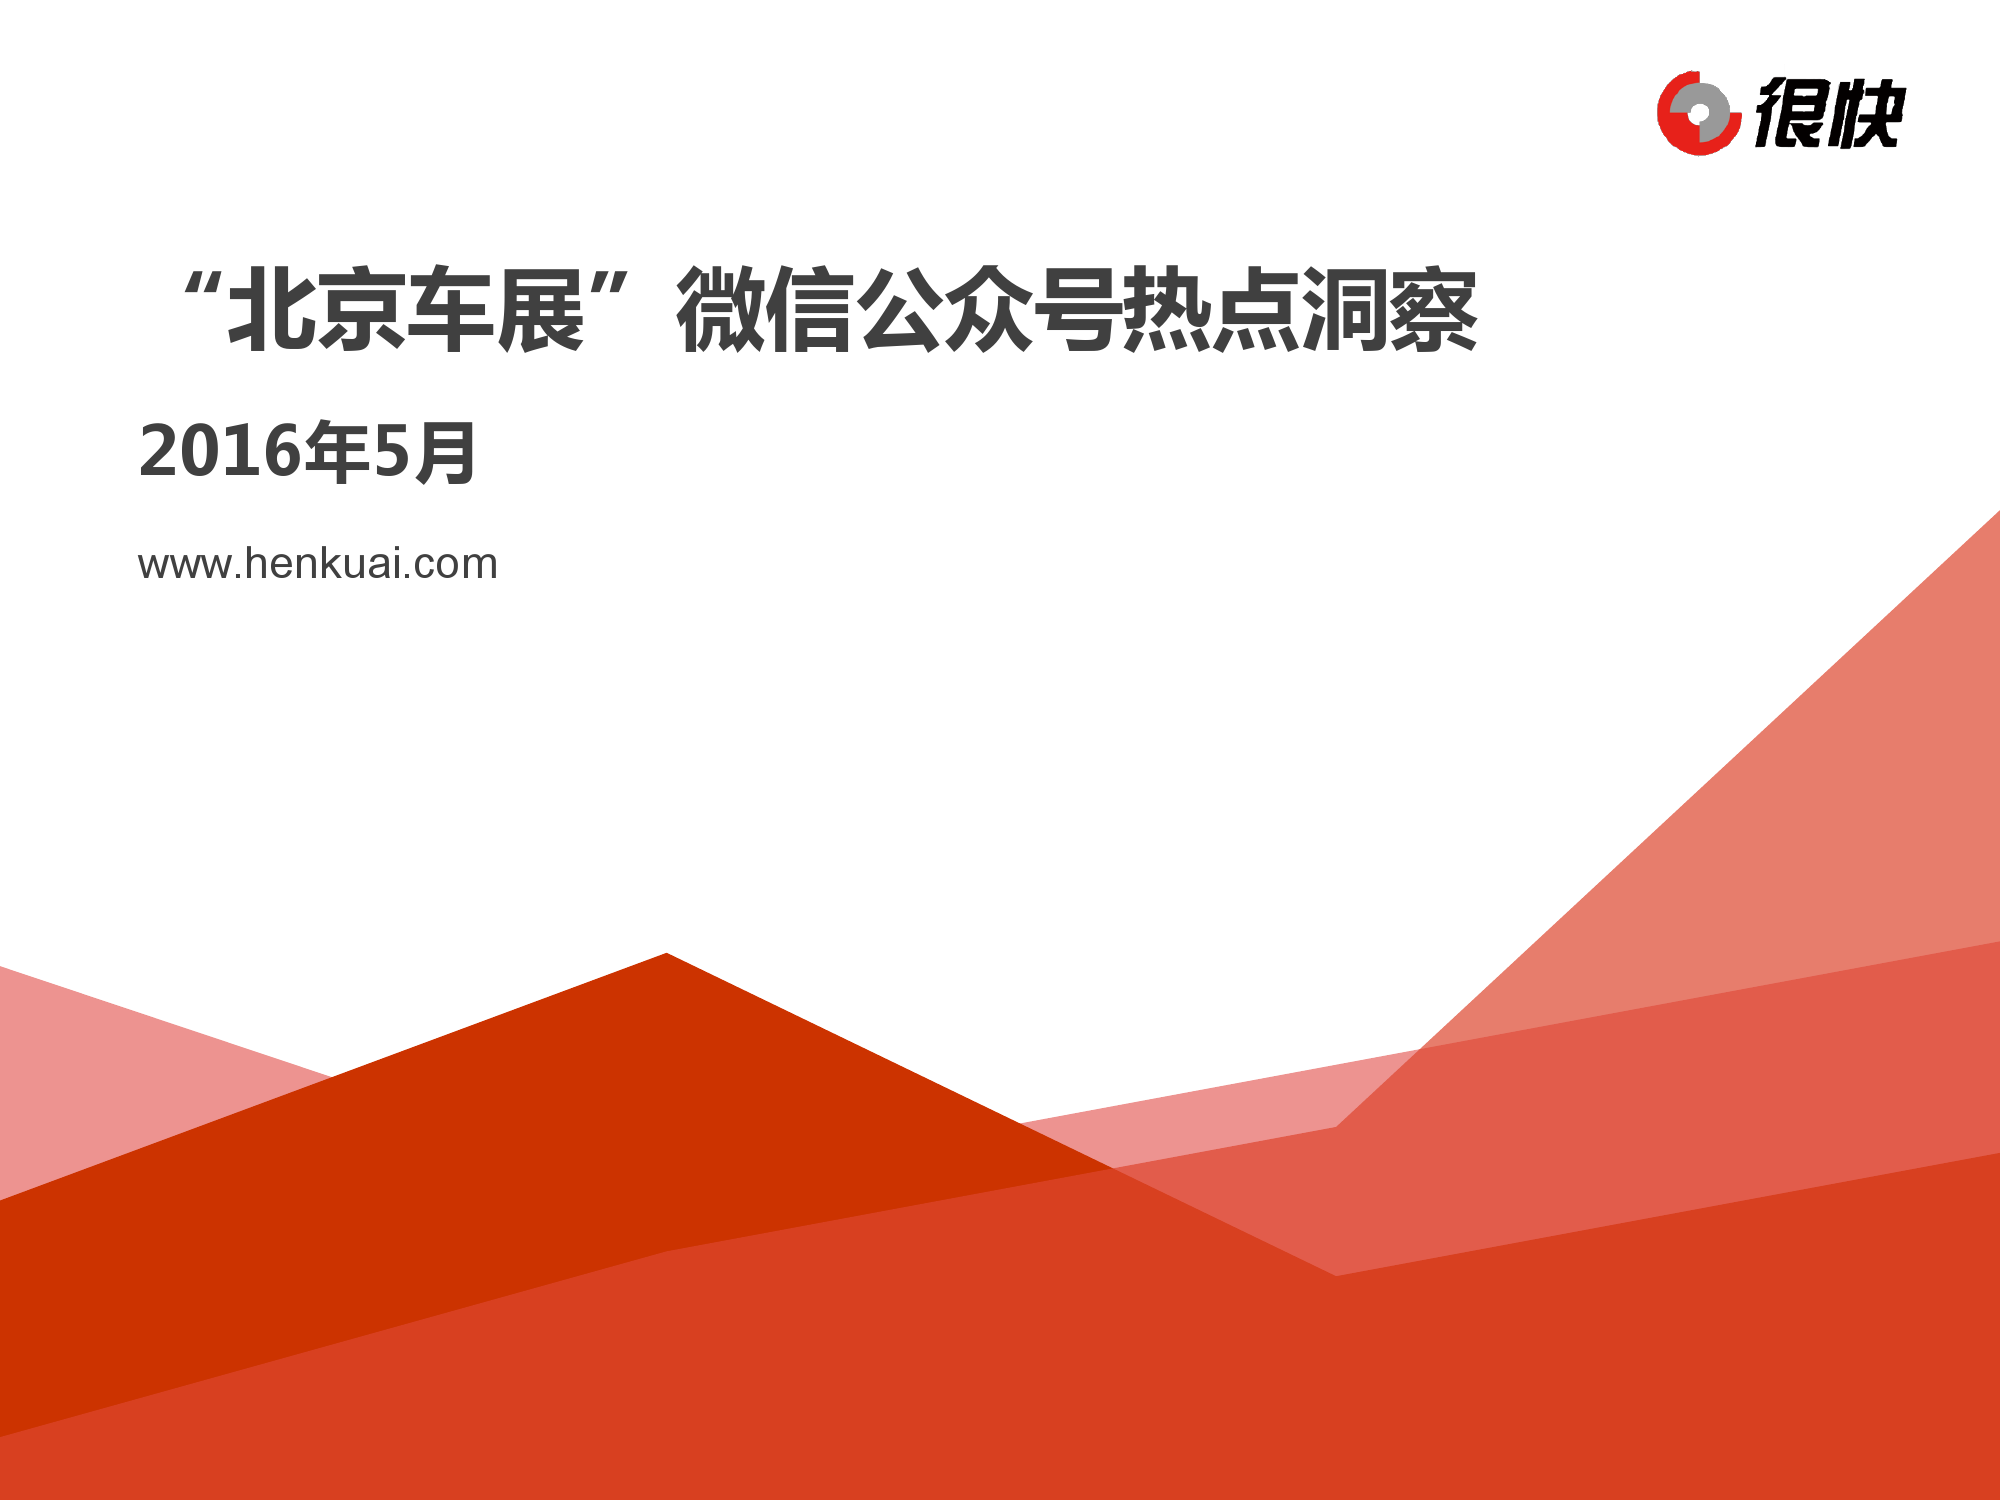 Henkuai-北京车展微信公众号热点洞察-0507_000001